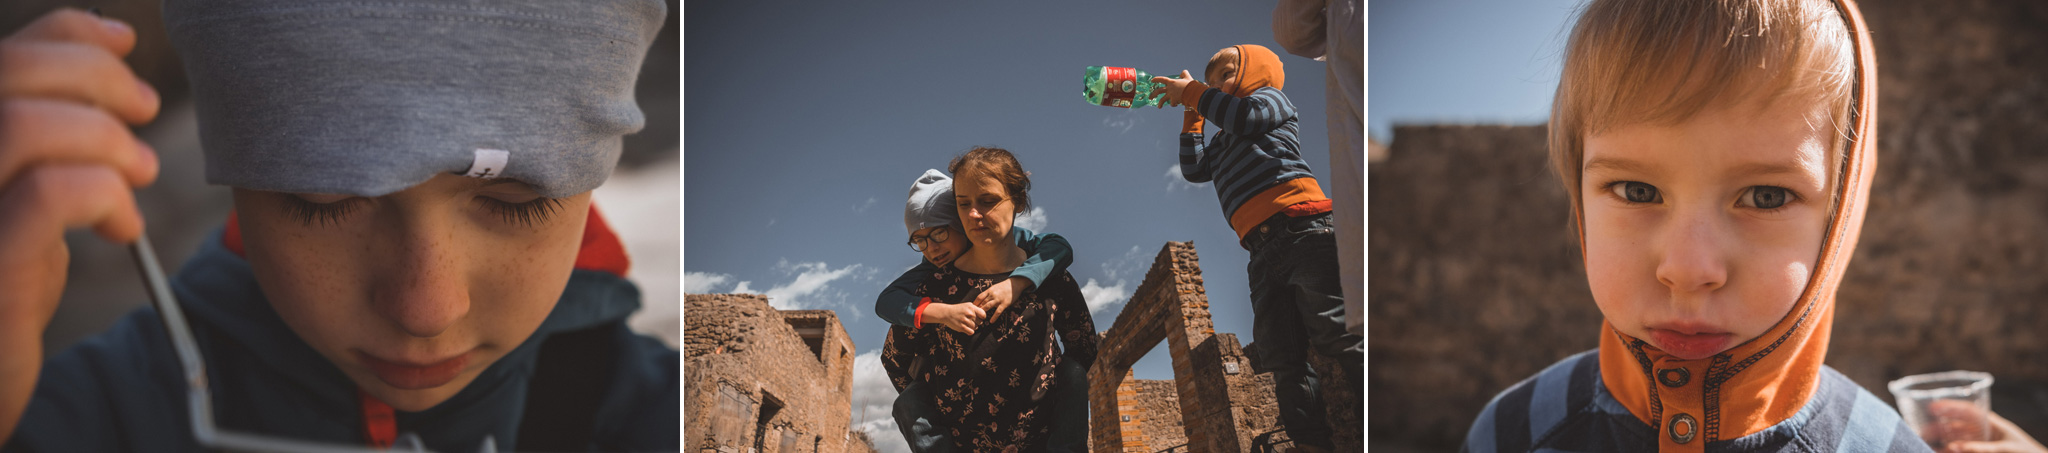 009-wedding-photographer-in-pompeii.jpg